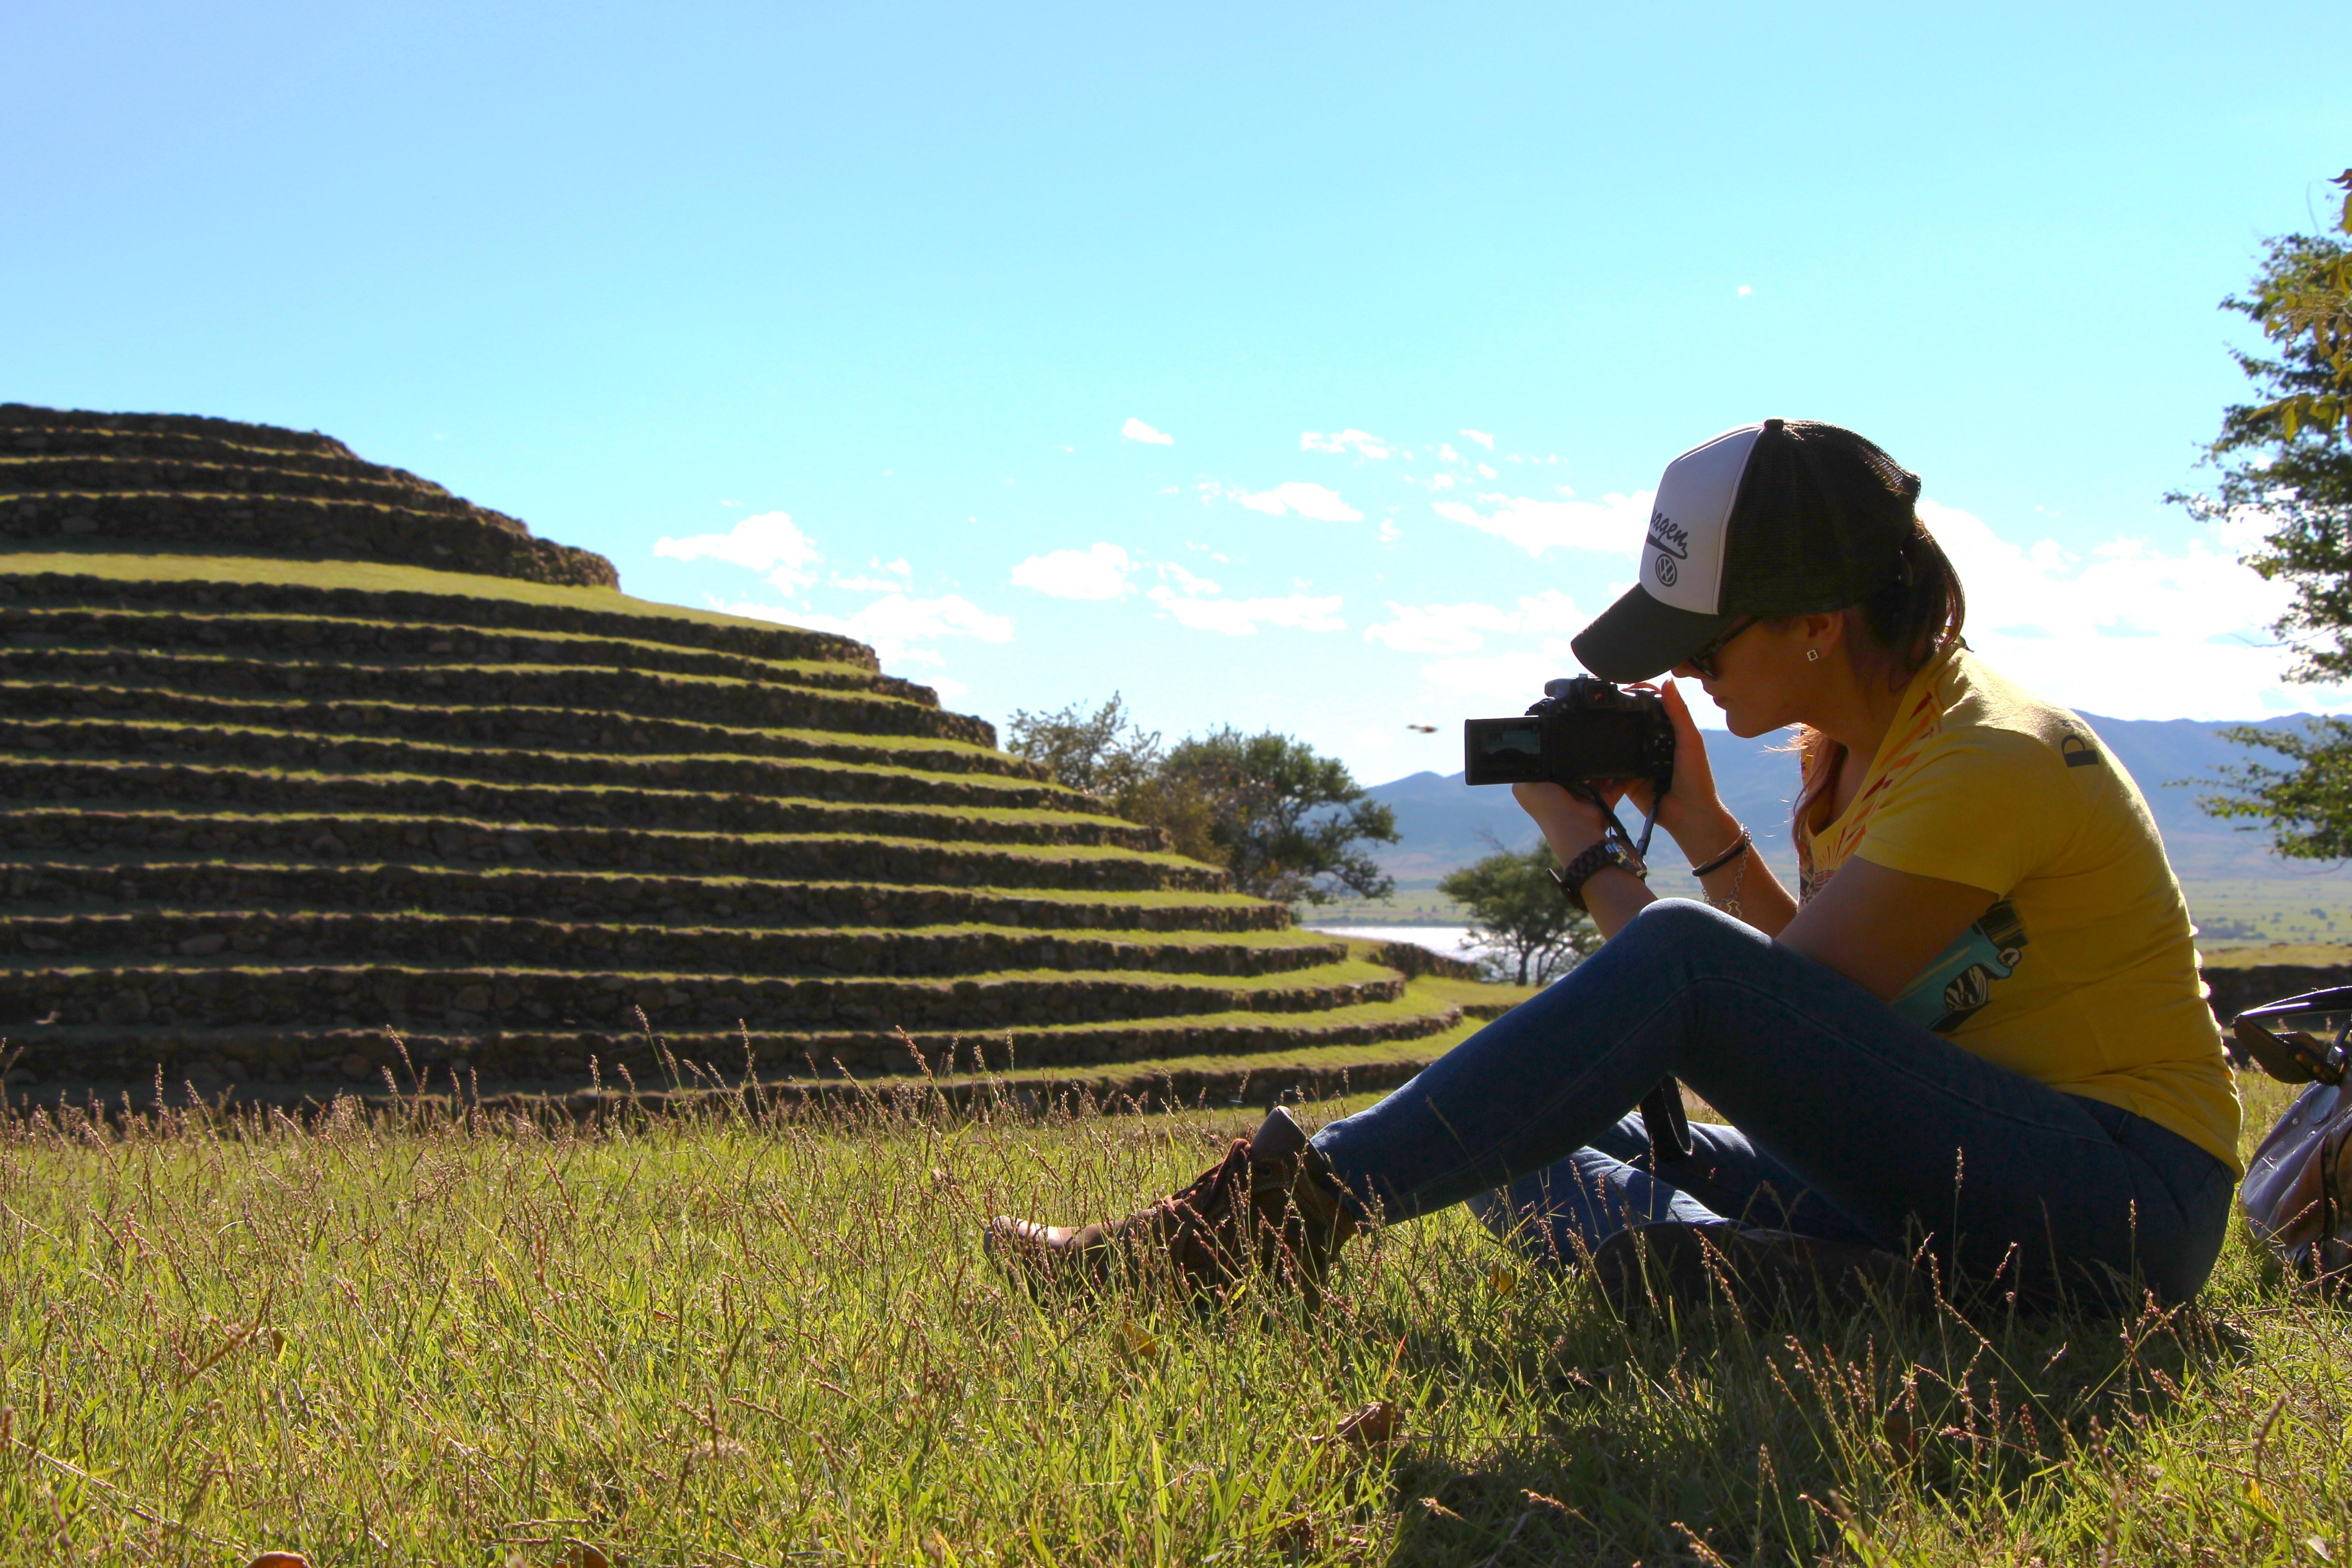 Guachimontones Rounded Pyramids